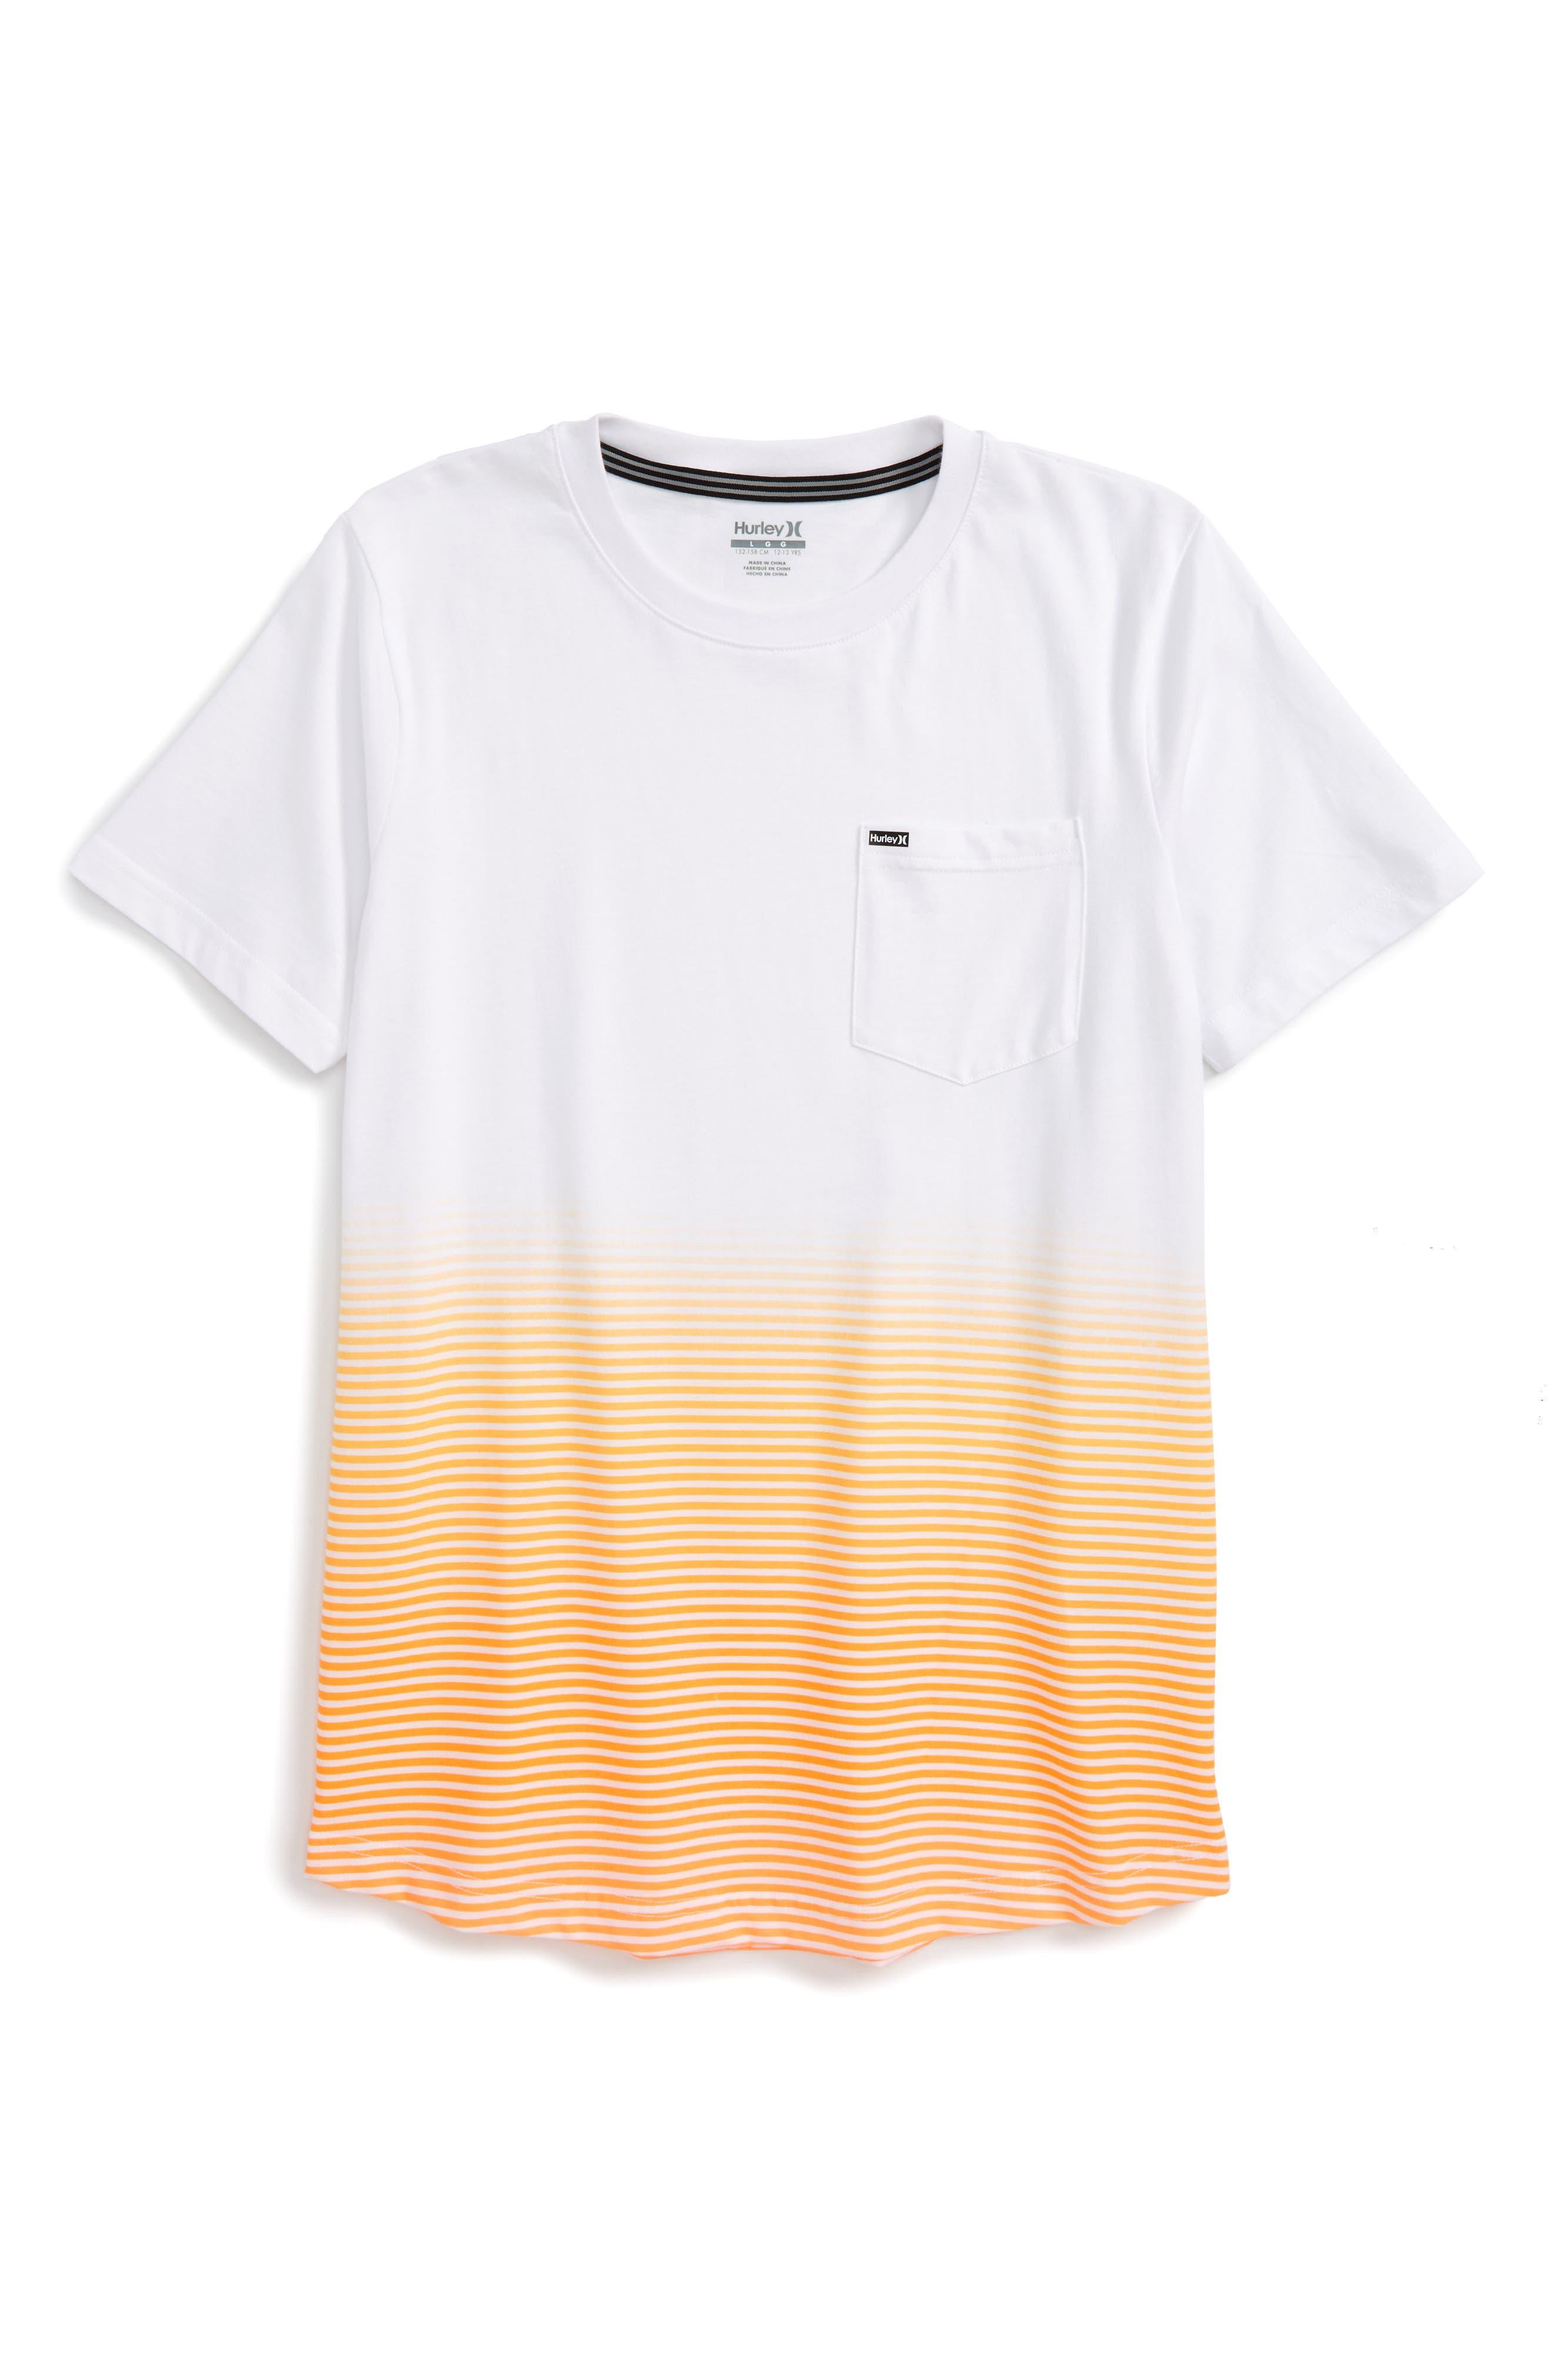 Alternate Image 1 Selected - Hurley Ombré Stripe T-Shirt (Big Boys)